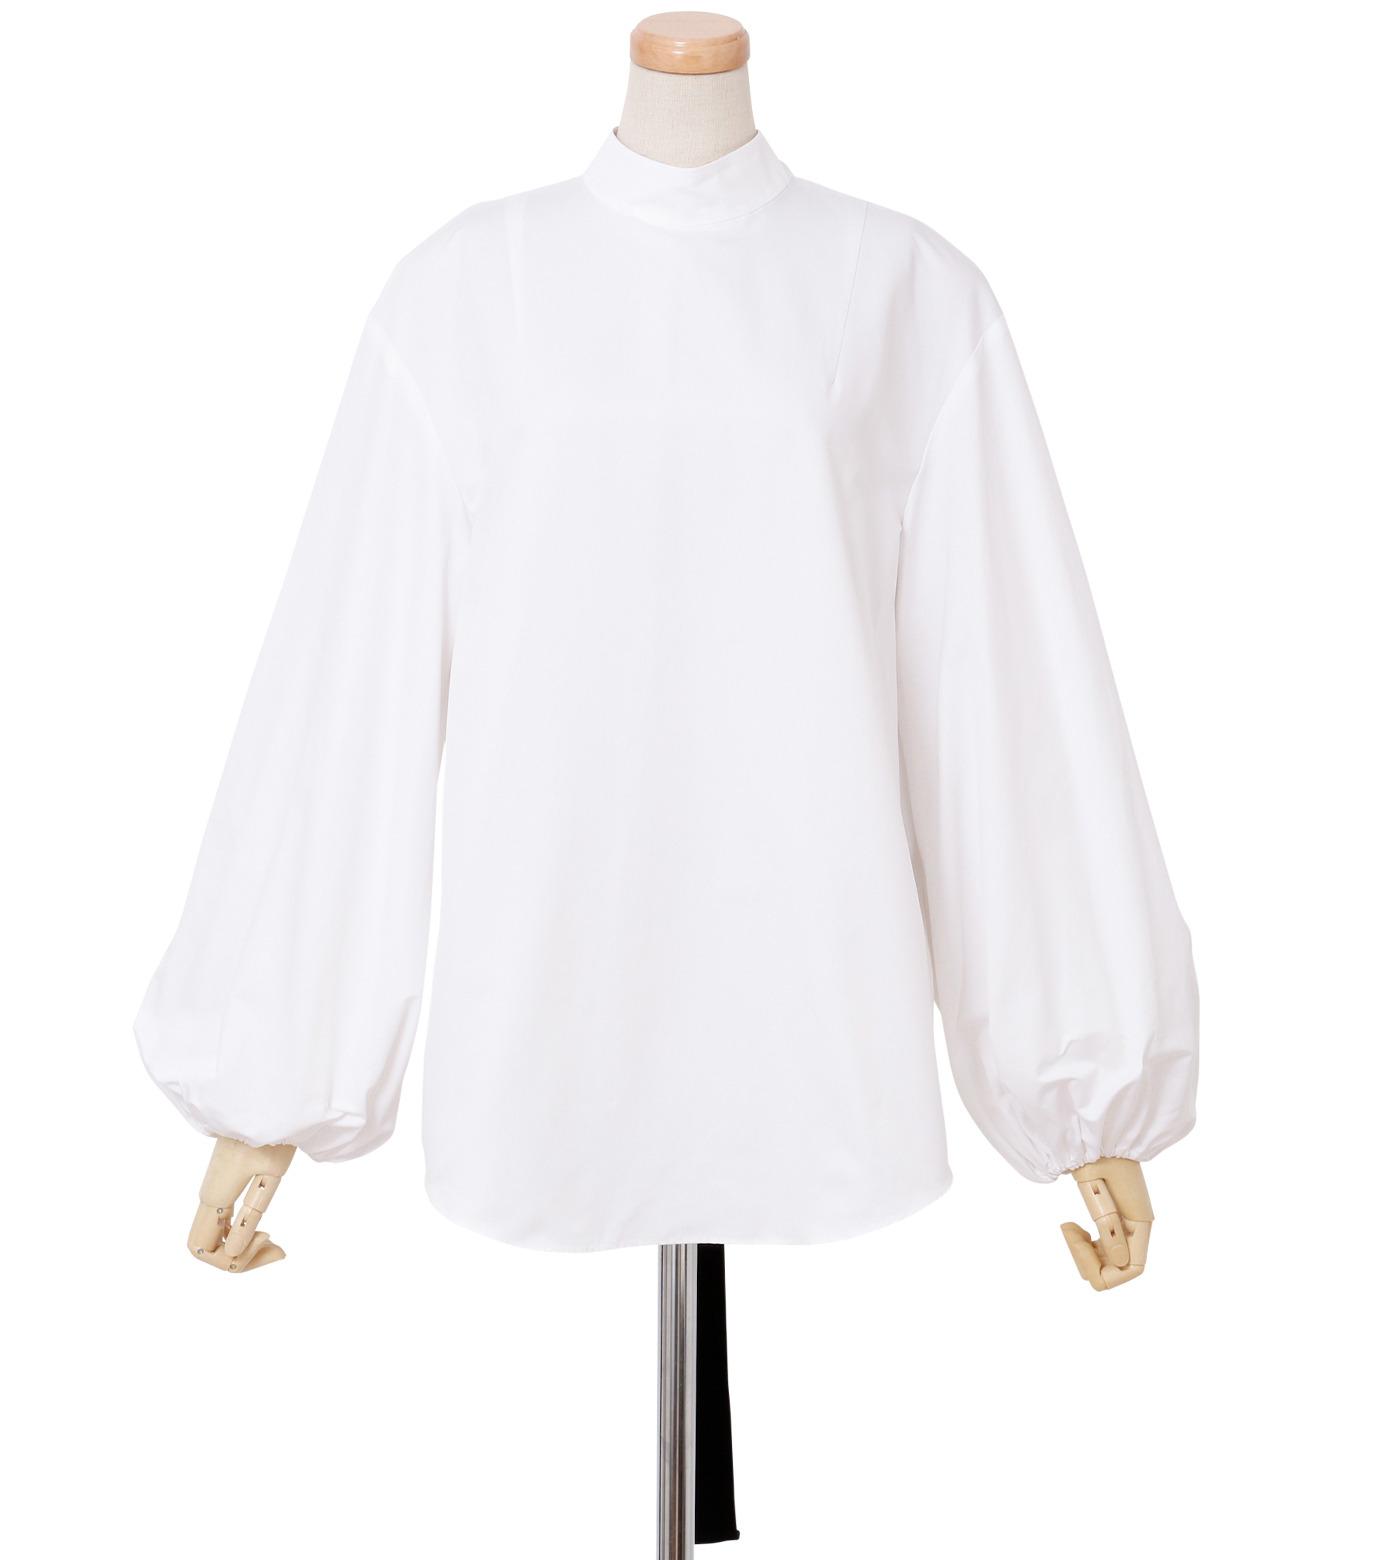 IRENE(アイレネ)のブァッファンスリーブトップス-WHITE(シャツ/shirt)-18A83004 拡大詳細画像1